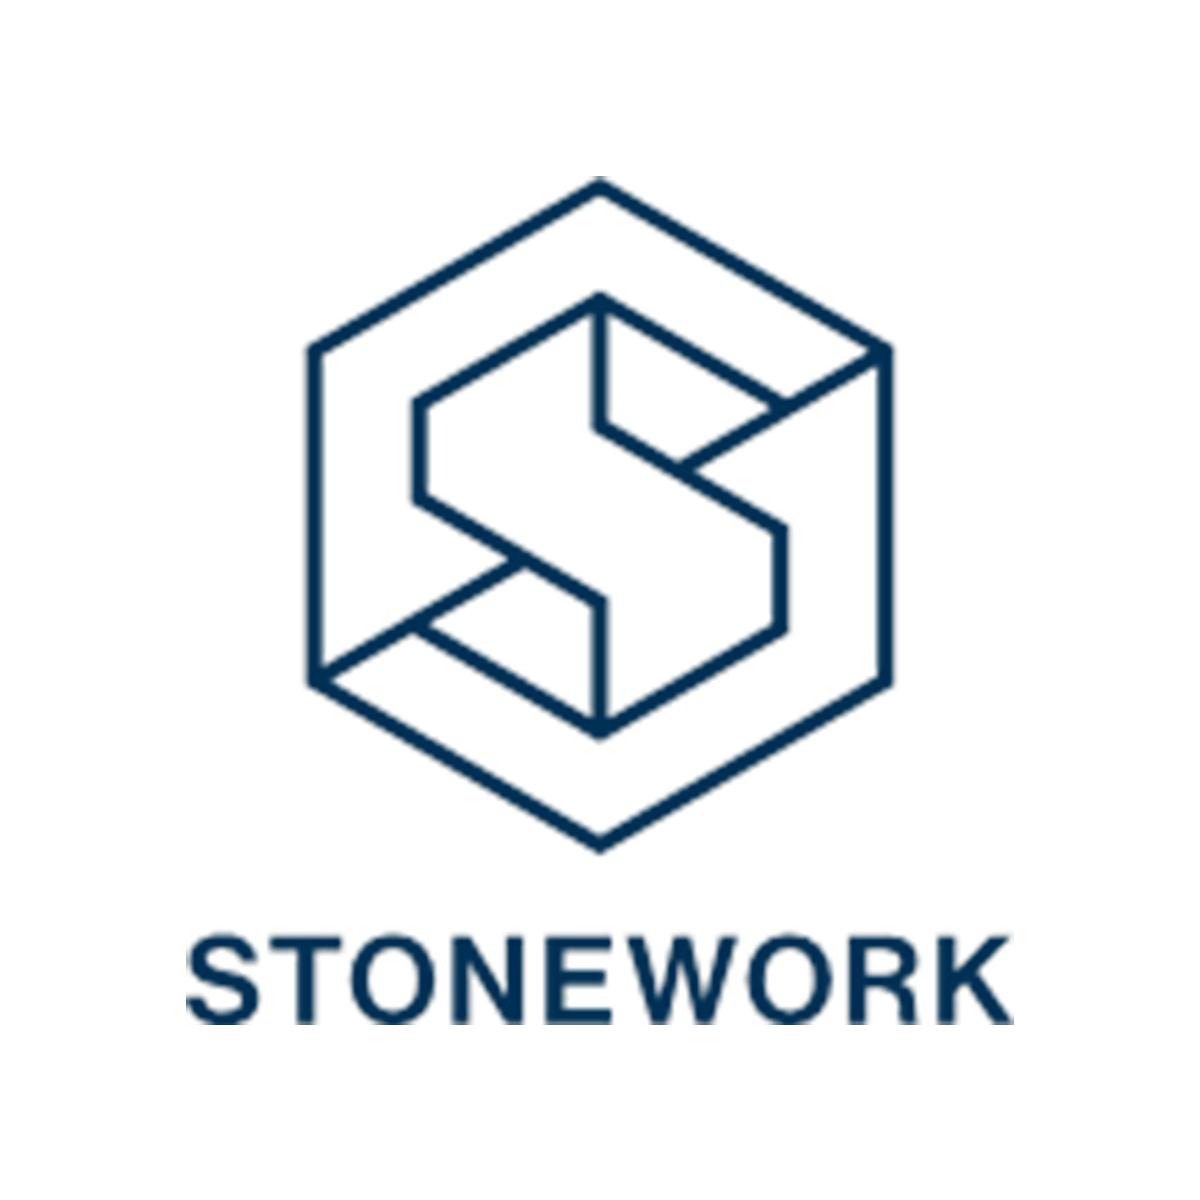 Stonework.png